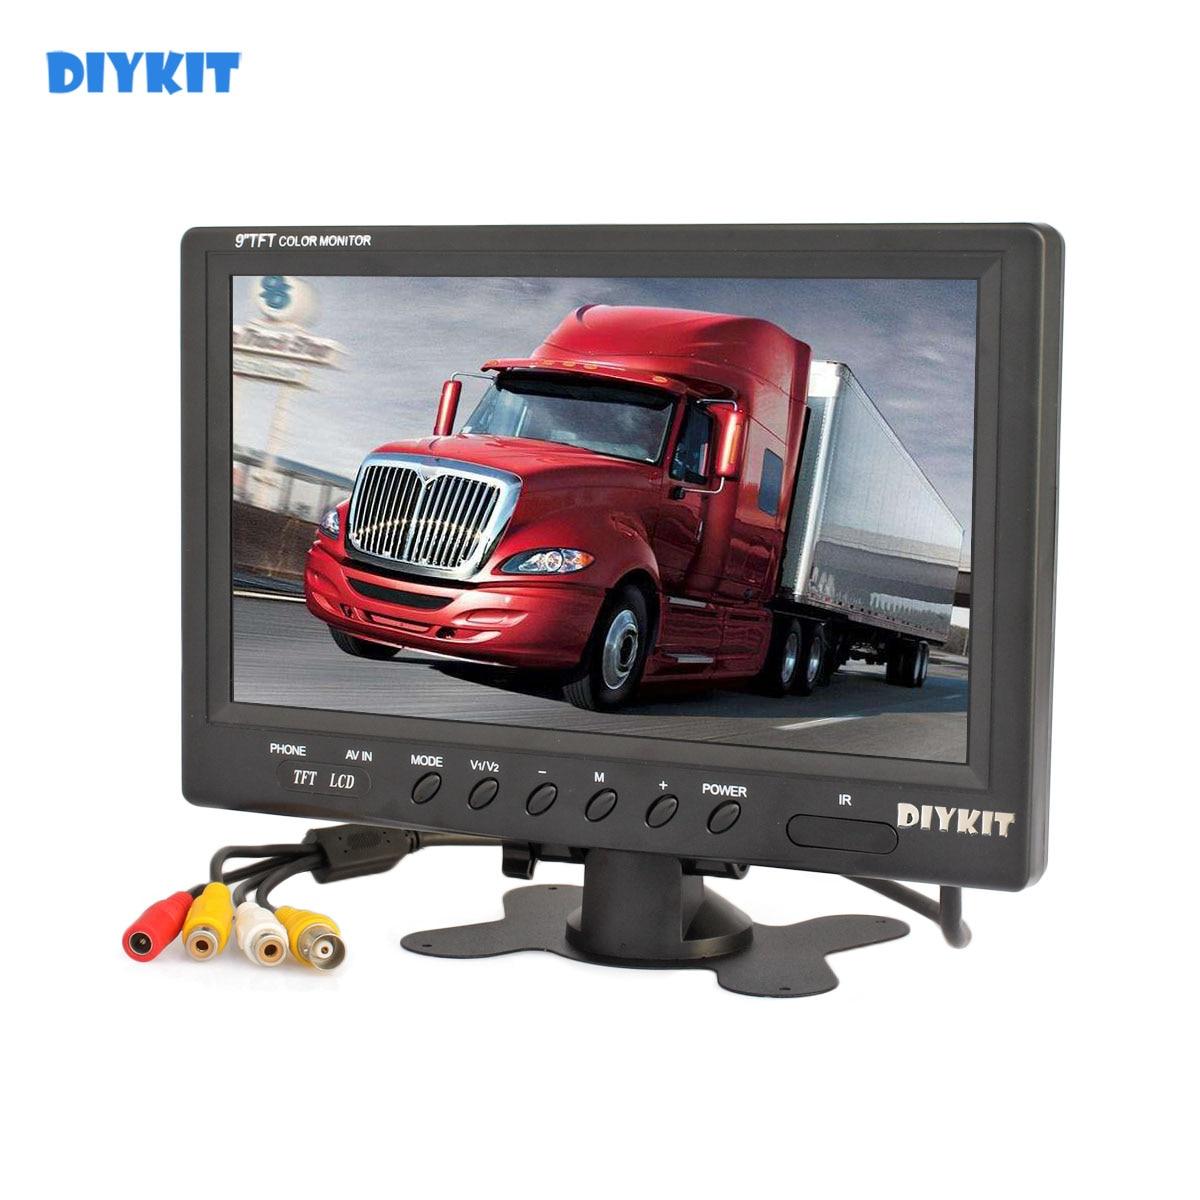 "DIYKIT 9"" TFT LCD Car HD Monitor Display Car Reverse Rear View Monitor Screen with BNC / AV Input Remote Control DVD VCR"